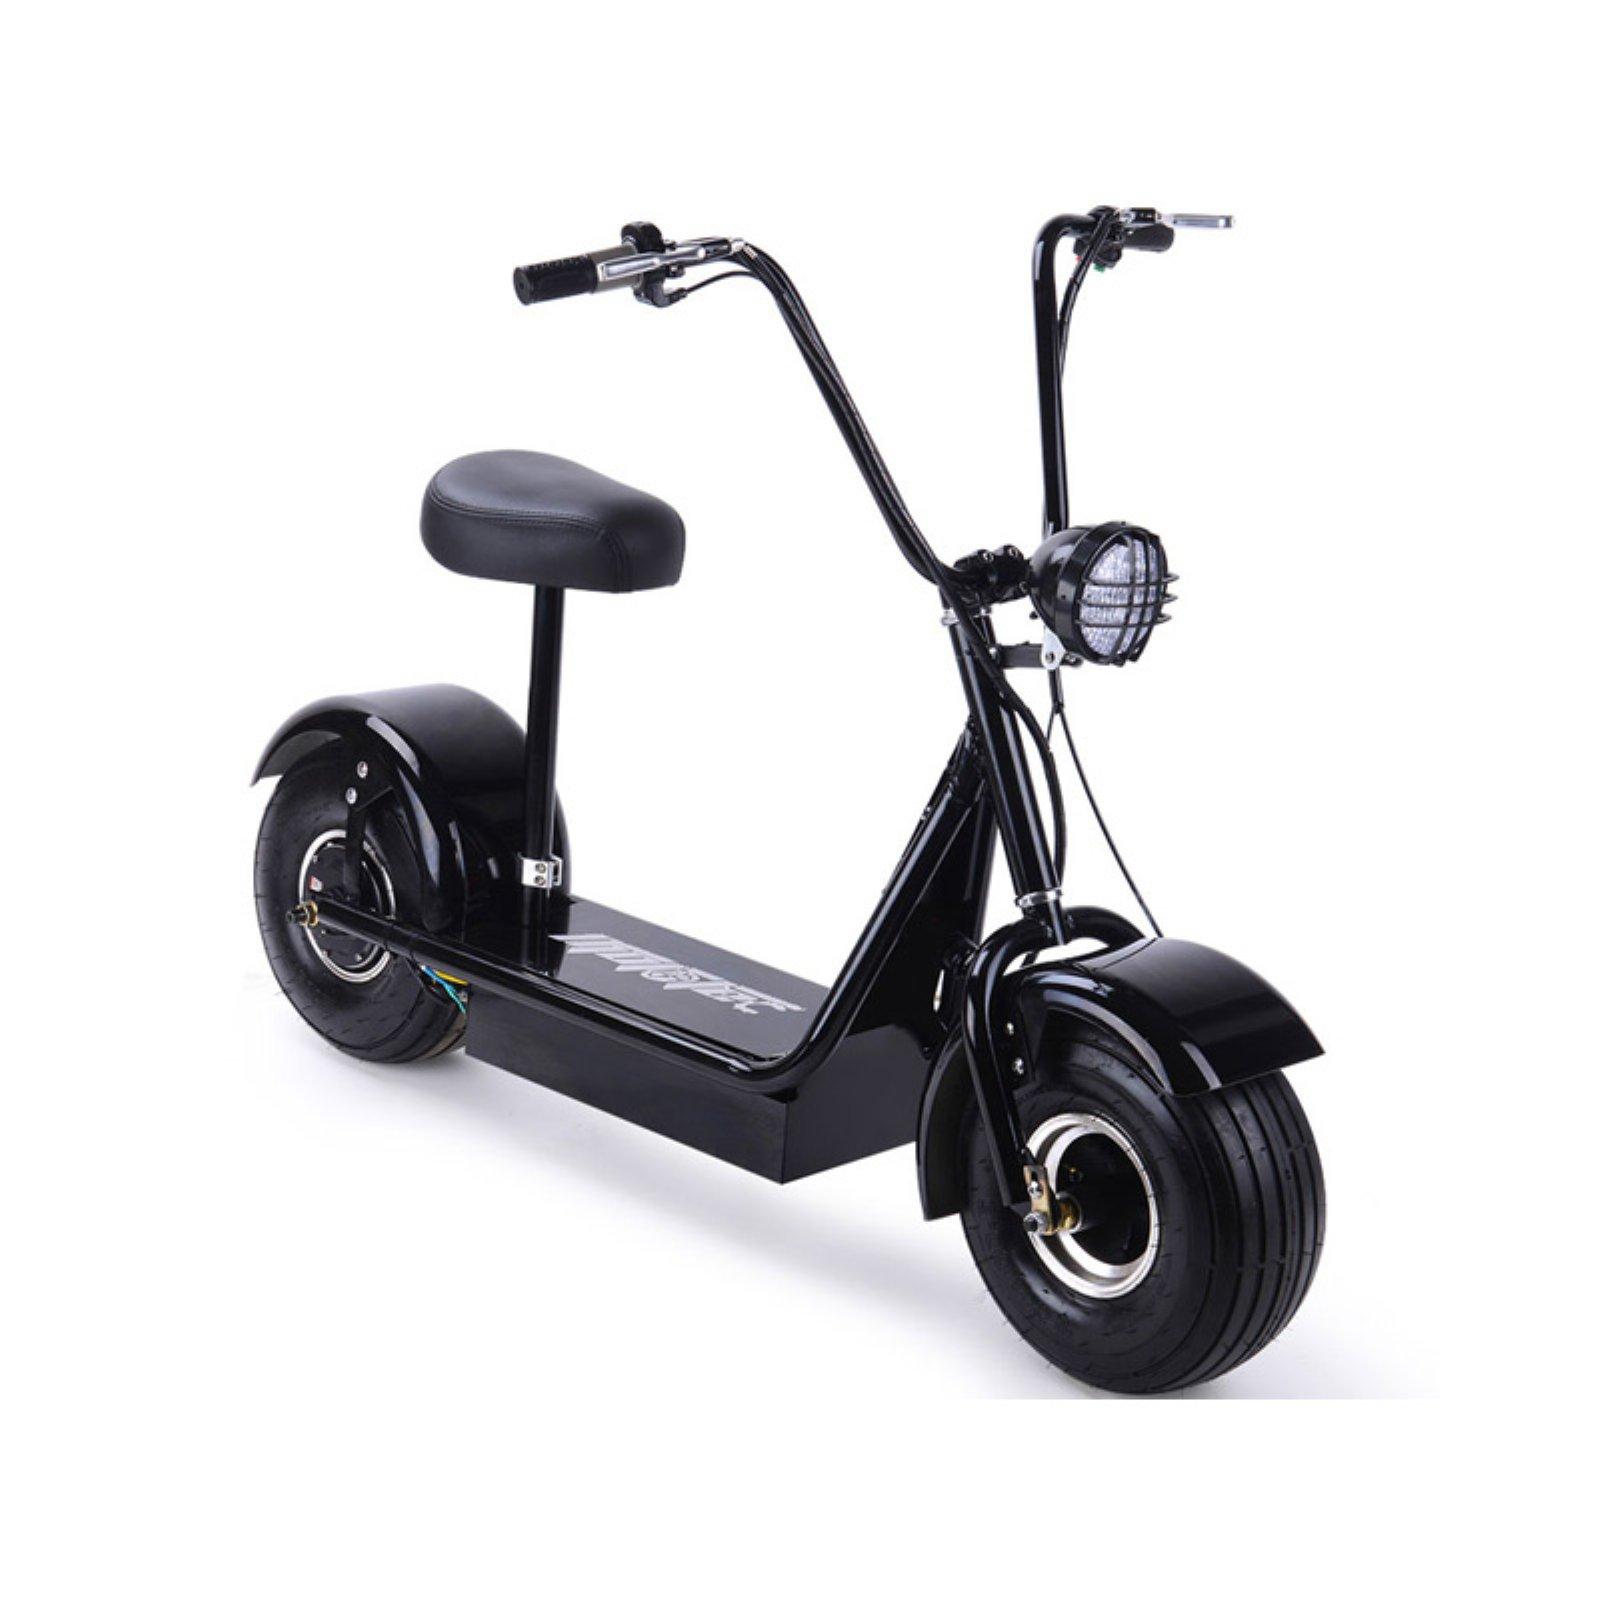 MotoTec-FatBoy-48v-500w-Fat-Tire-Electric-Scooter